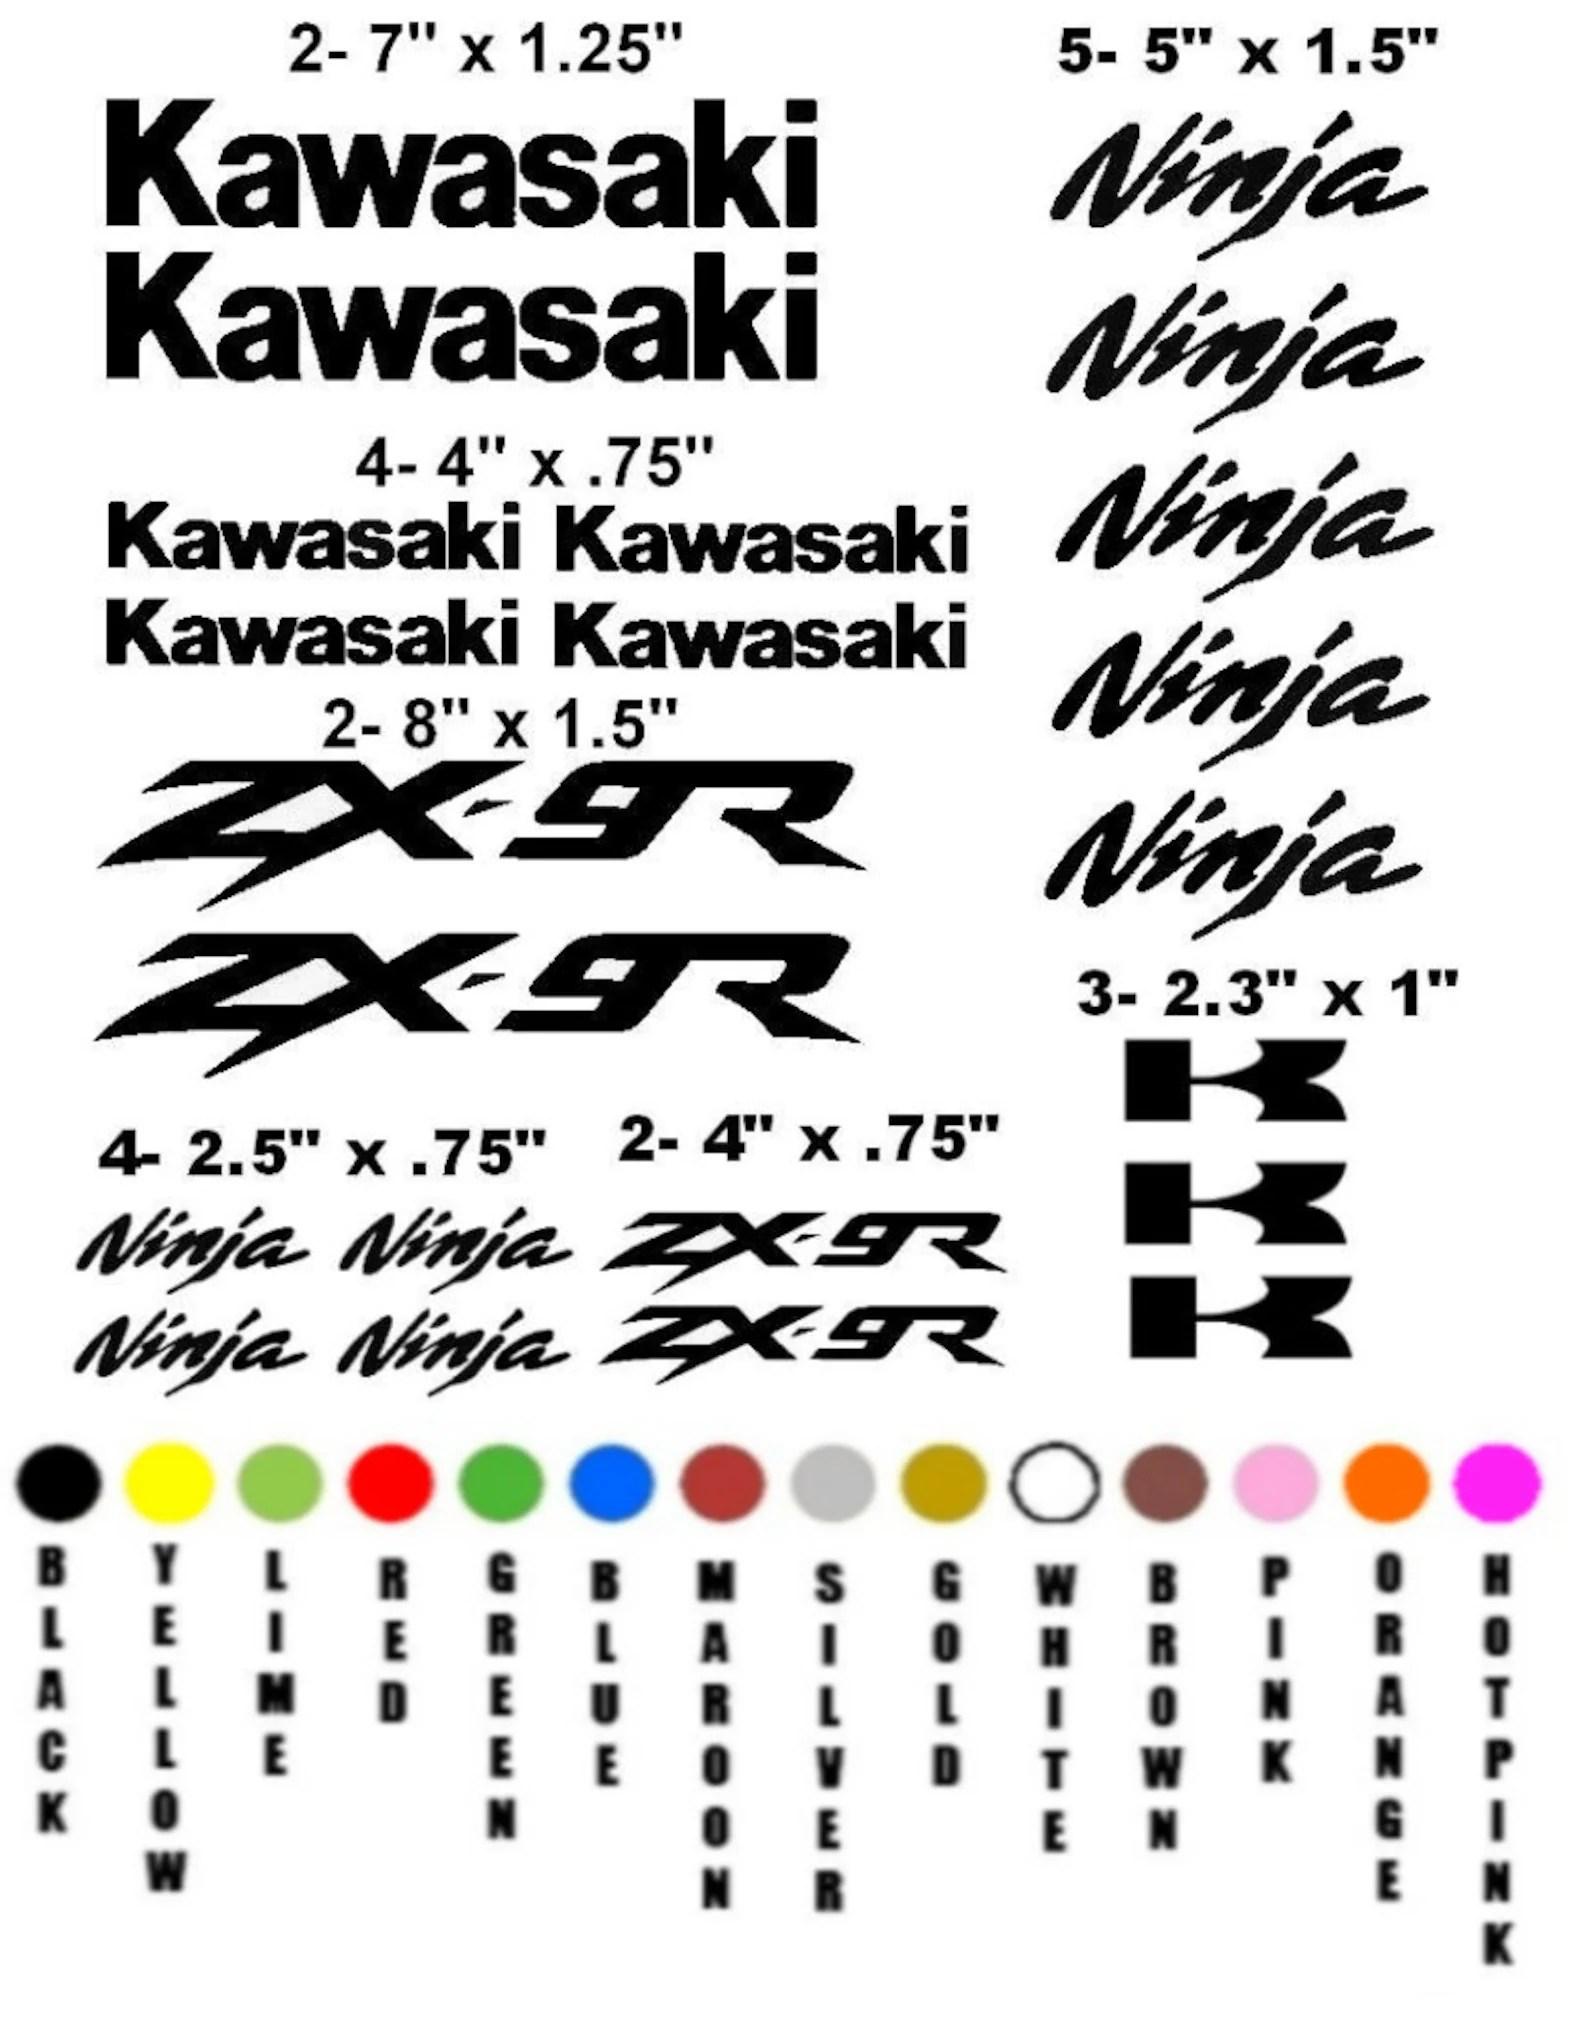 KAWASAKI ZX-9R NINJA motorcycle sticker decal kit race